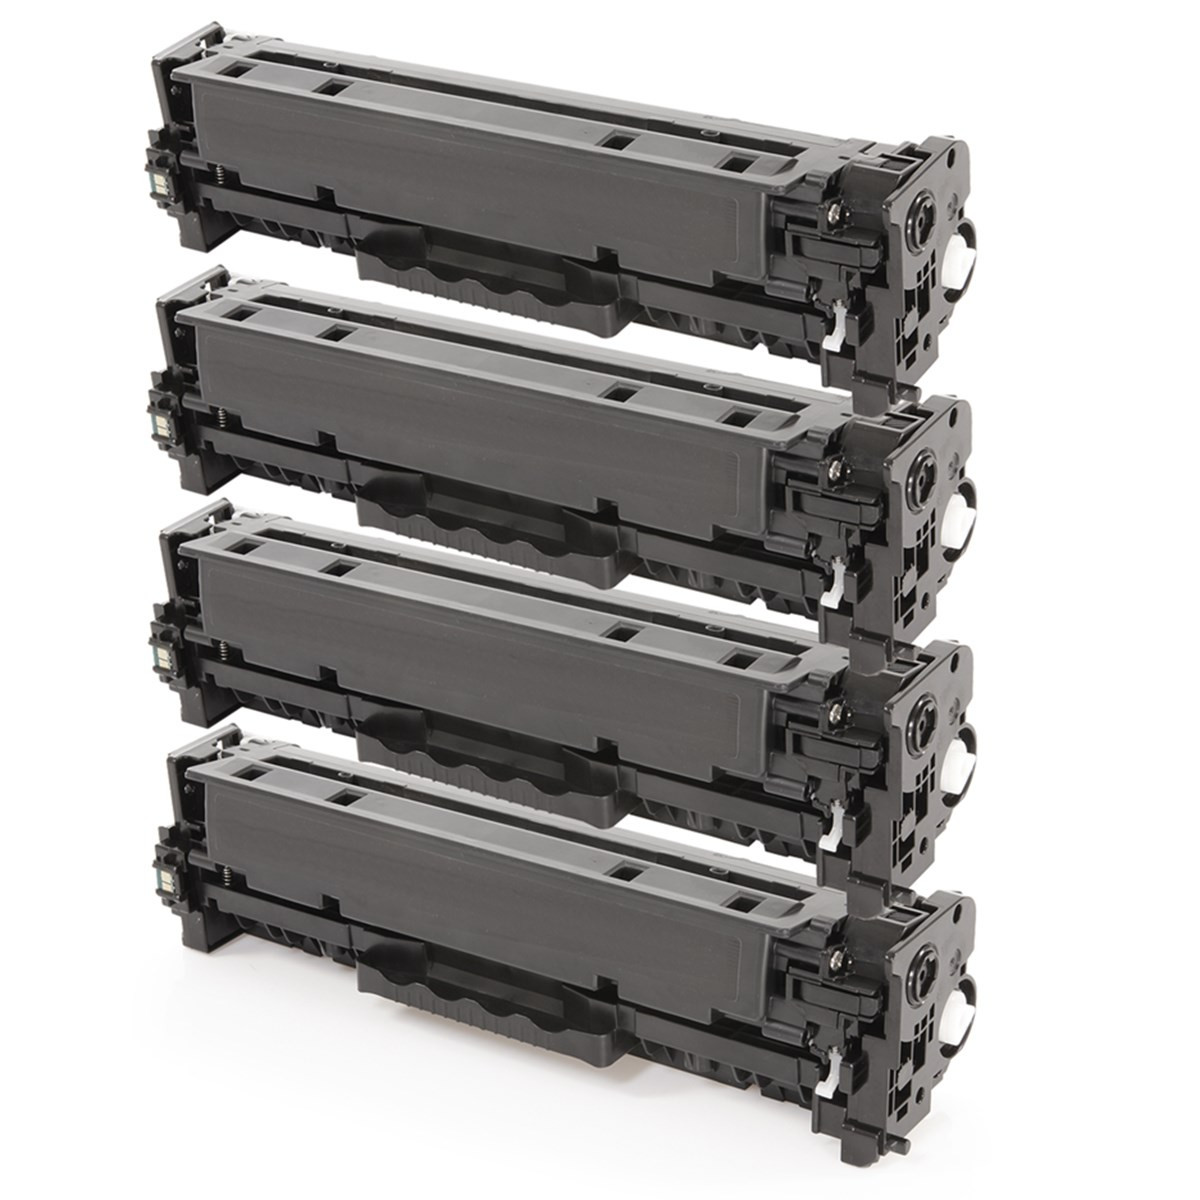 Kit 4 Toner Compatível com HP CC530A CC531A CC532A CC533A | CP2020 CP2025 CM2320 | Premium